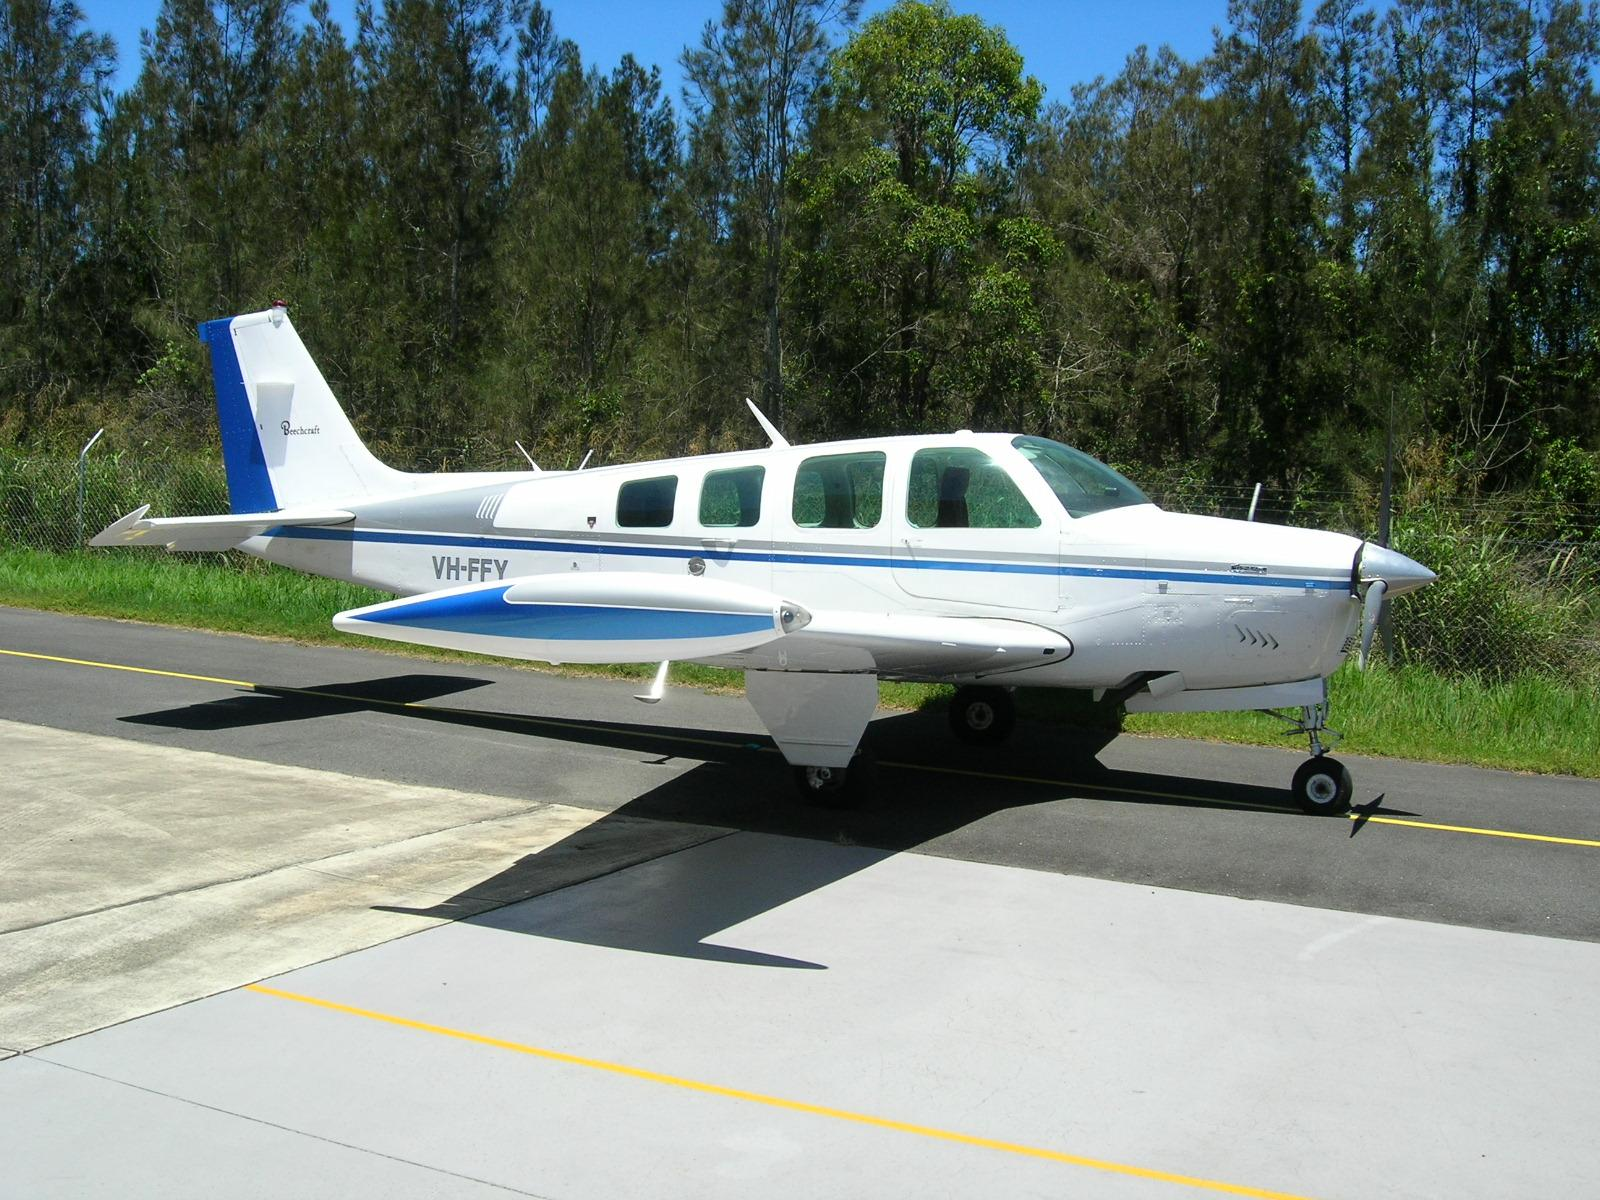 Beechcraft Bonanza A36 For Sale Beechcraft Bonanza A36